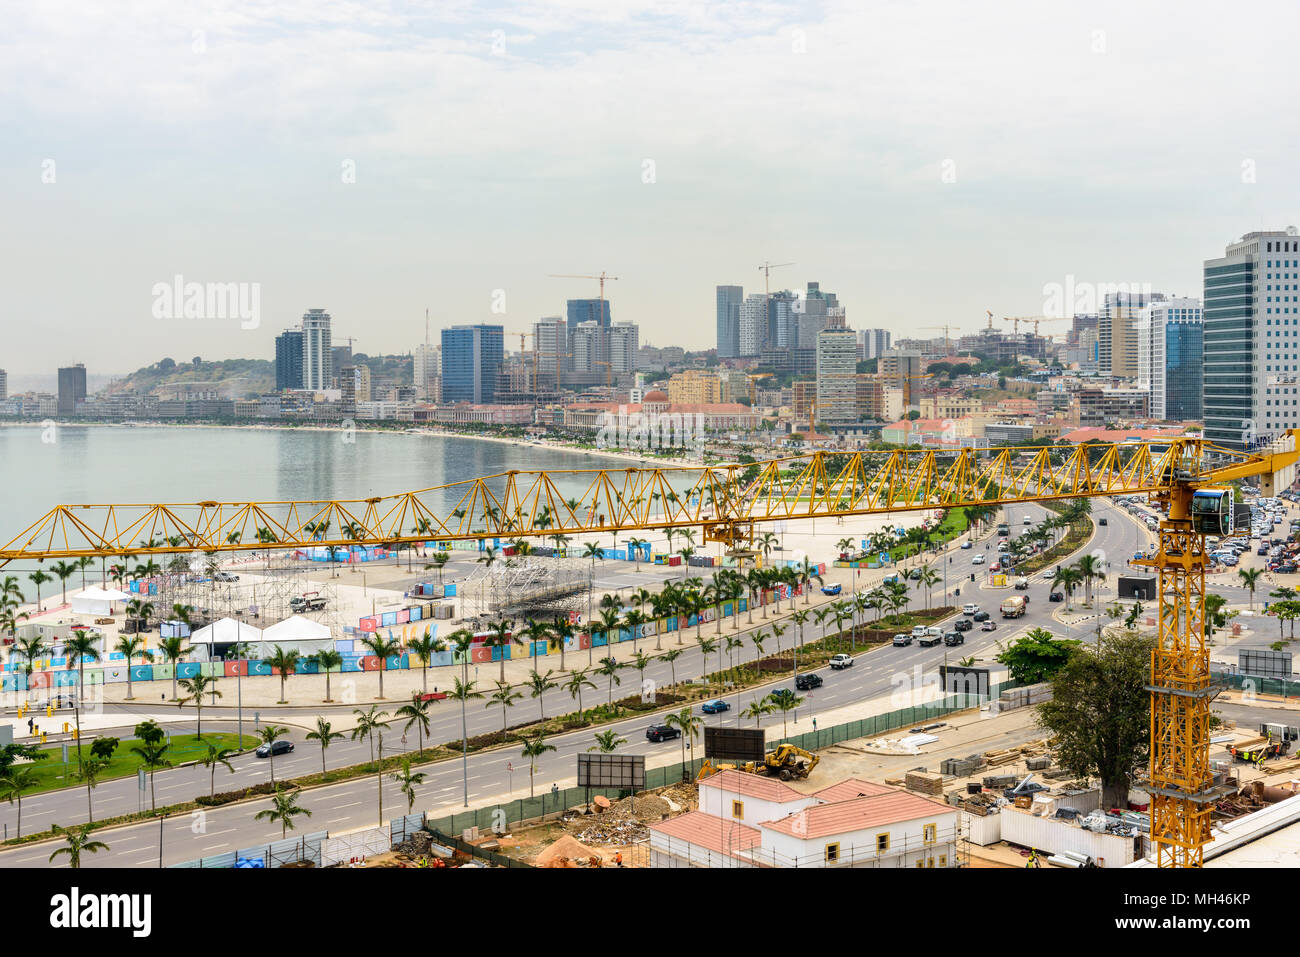 City of Luanda, Angola - Stock Image